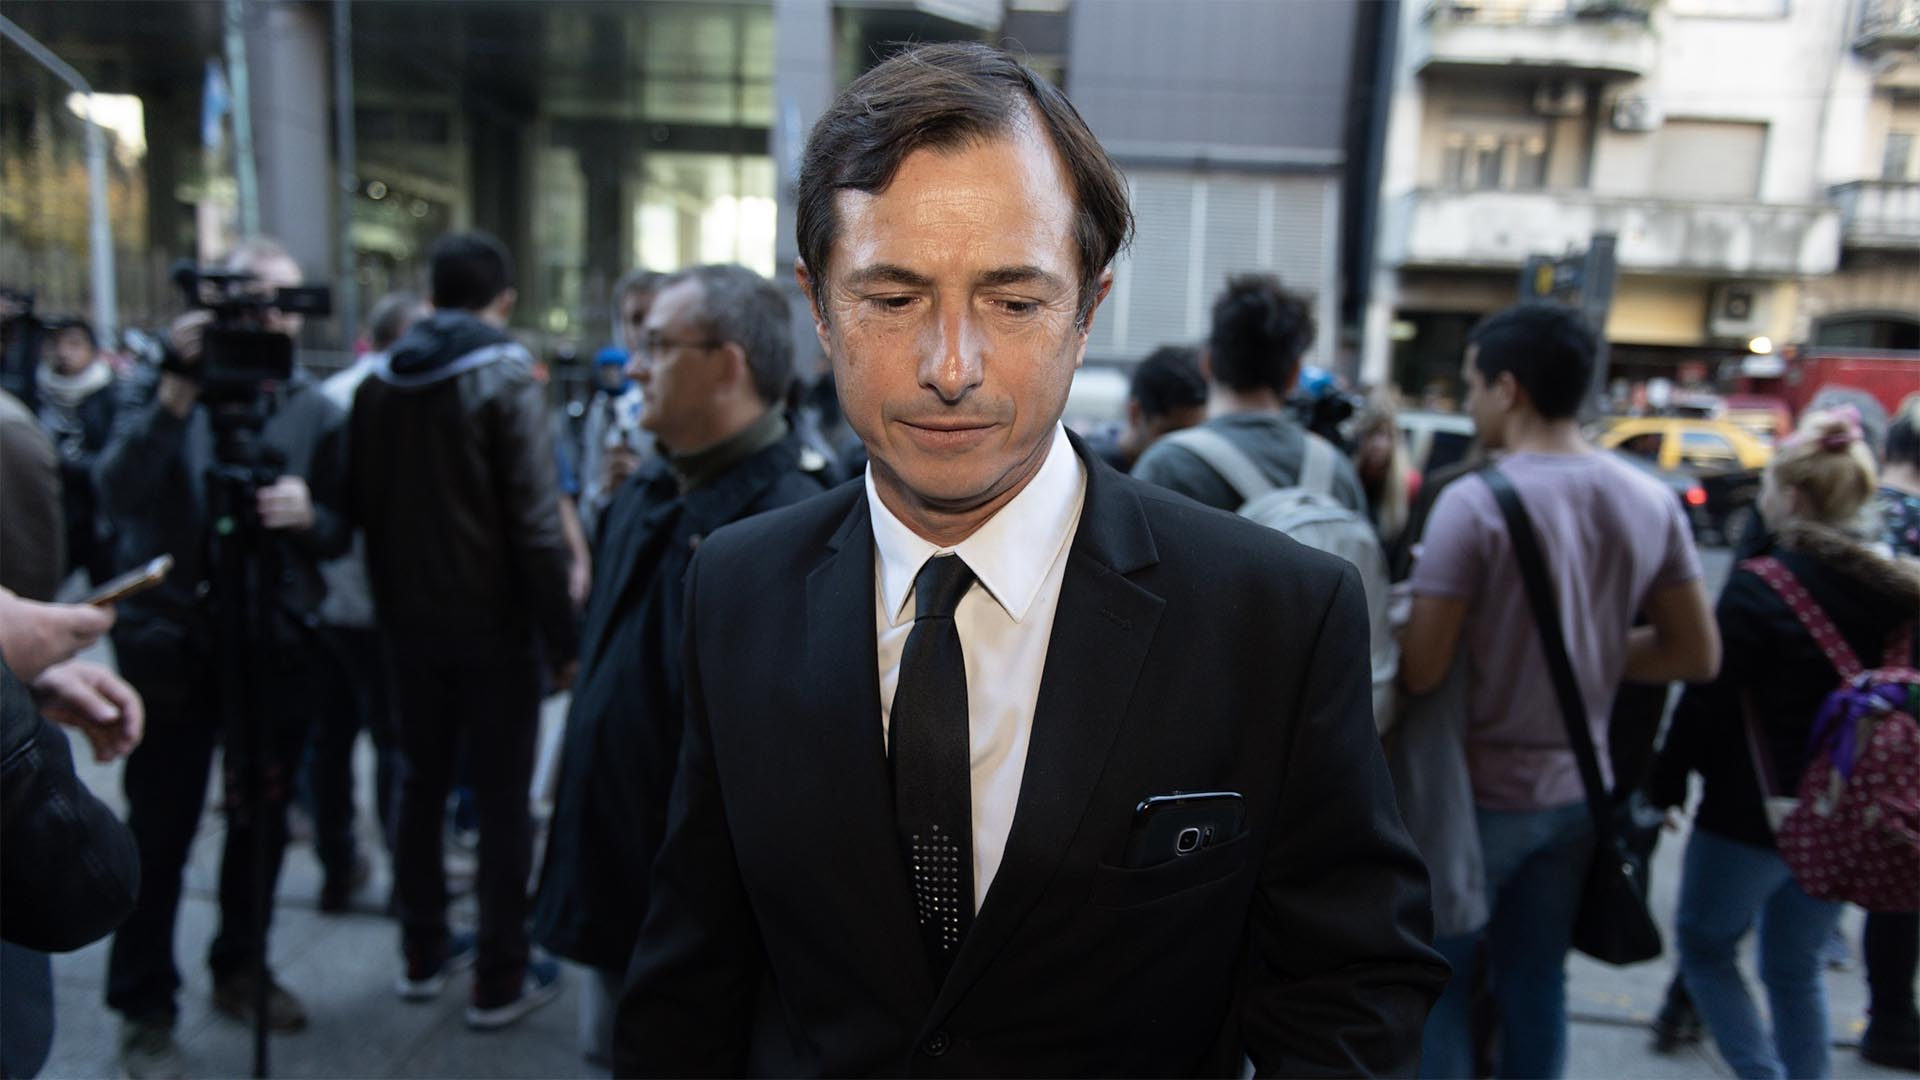 El diputado nacional Daniel Lipovetzky